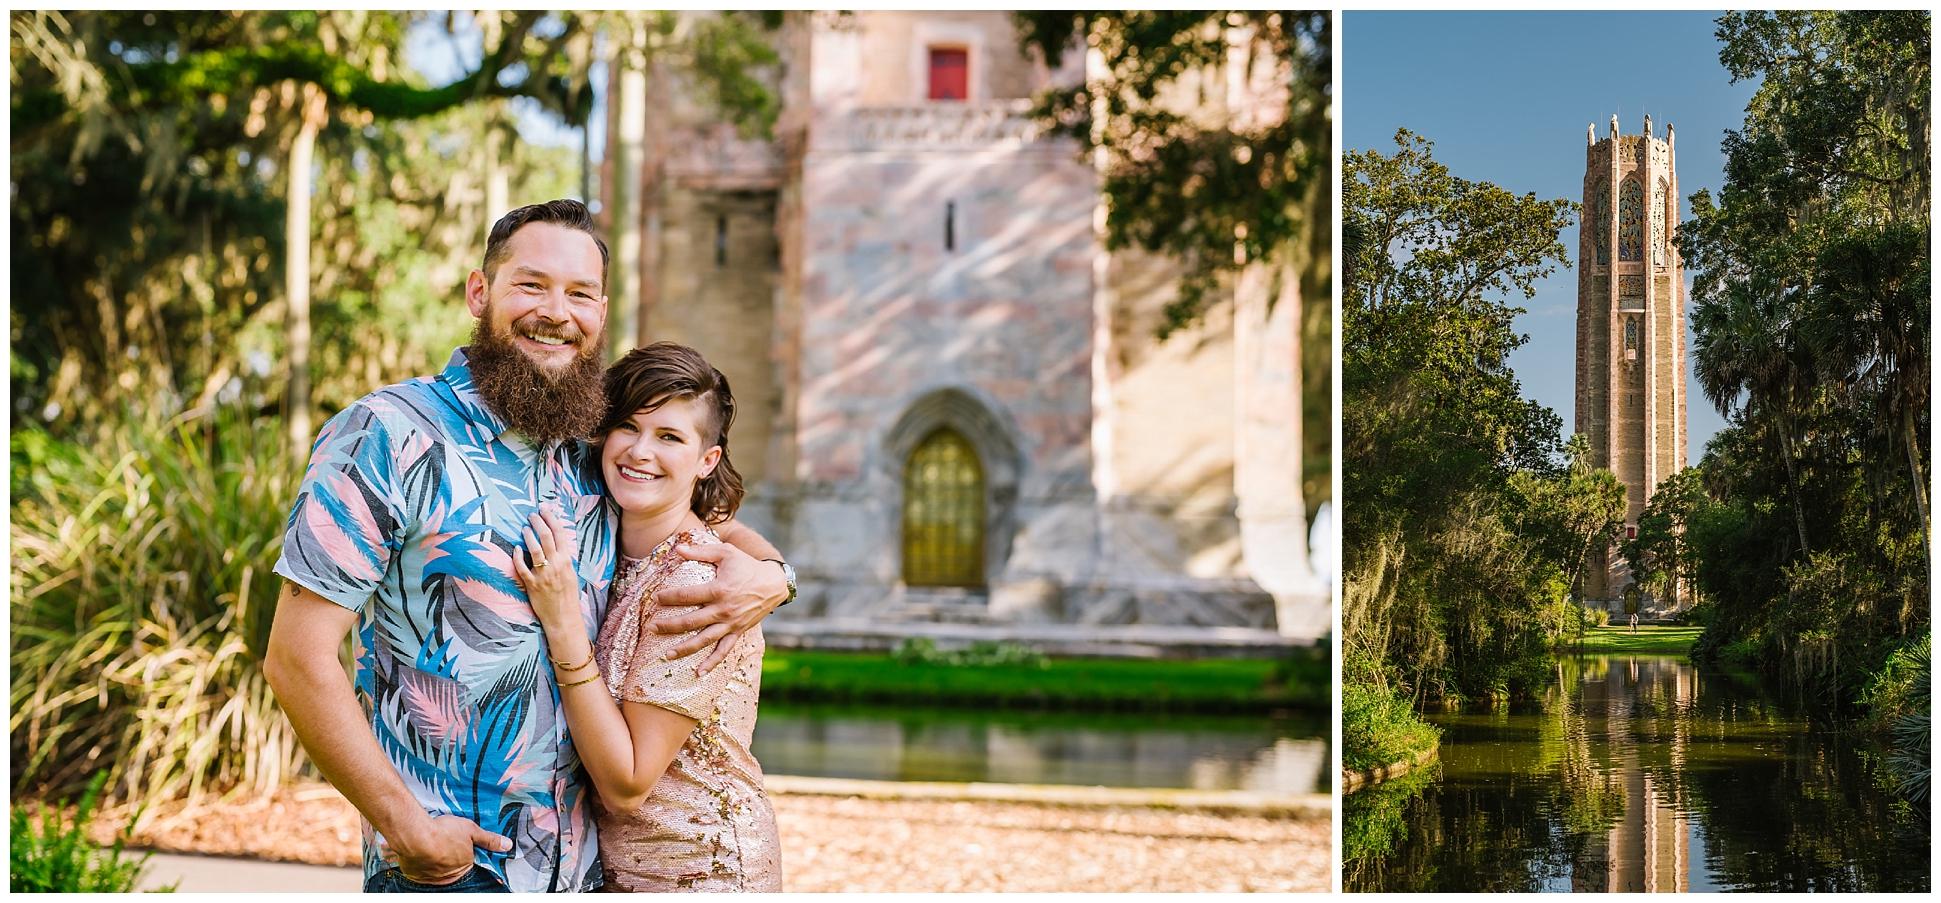 Ashlee-hamon-photography-year-in-review-2016-travel-wanderlust-vsco-adventure-wedding_0105.jpg